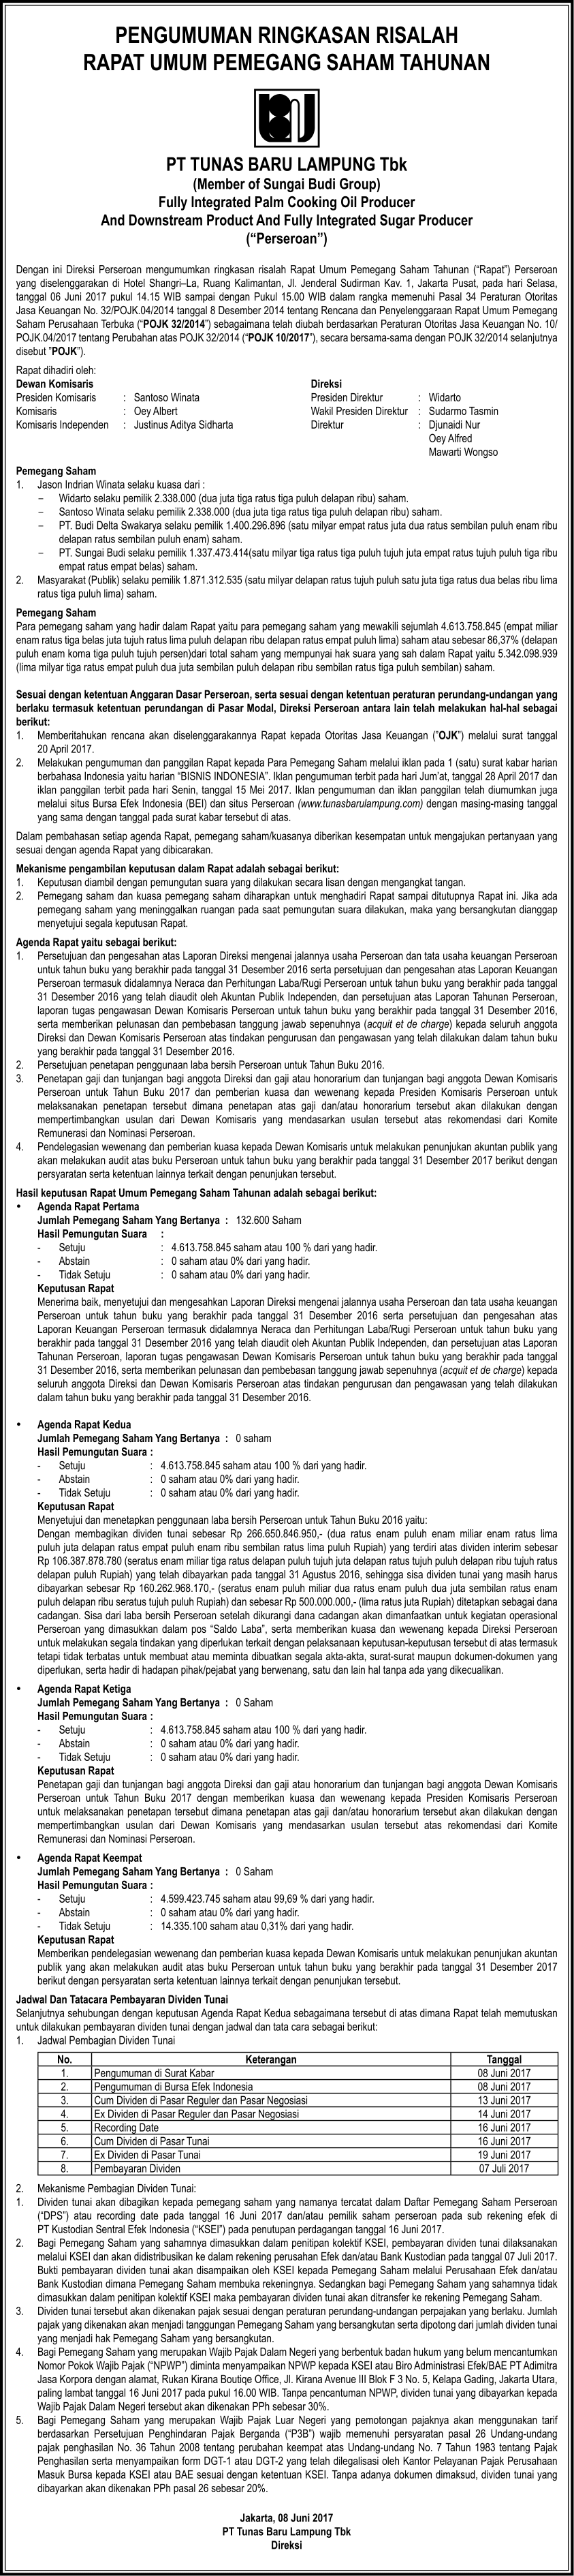 PengumumanRisalahRUPST TBL Bisnis 3(107)x480 08_Juni_2017(z)-1